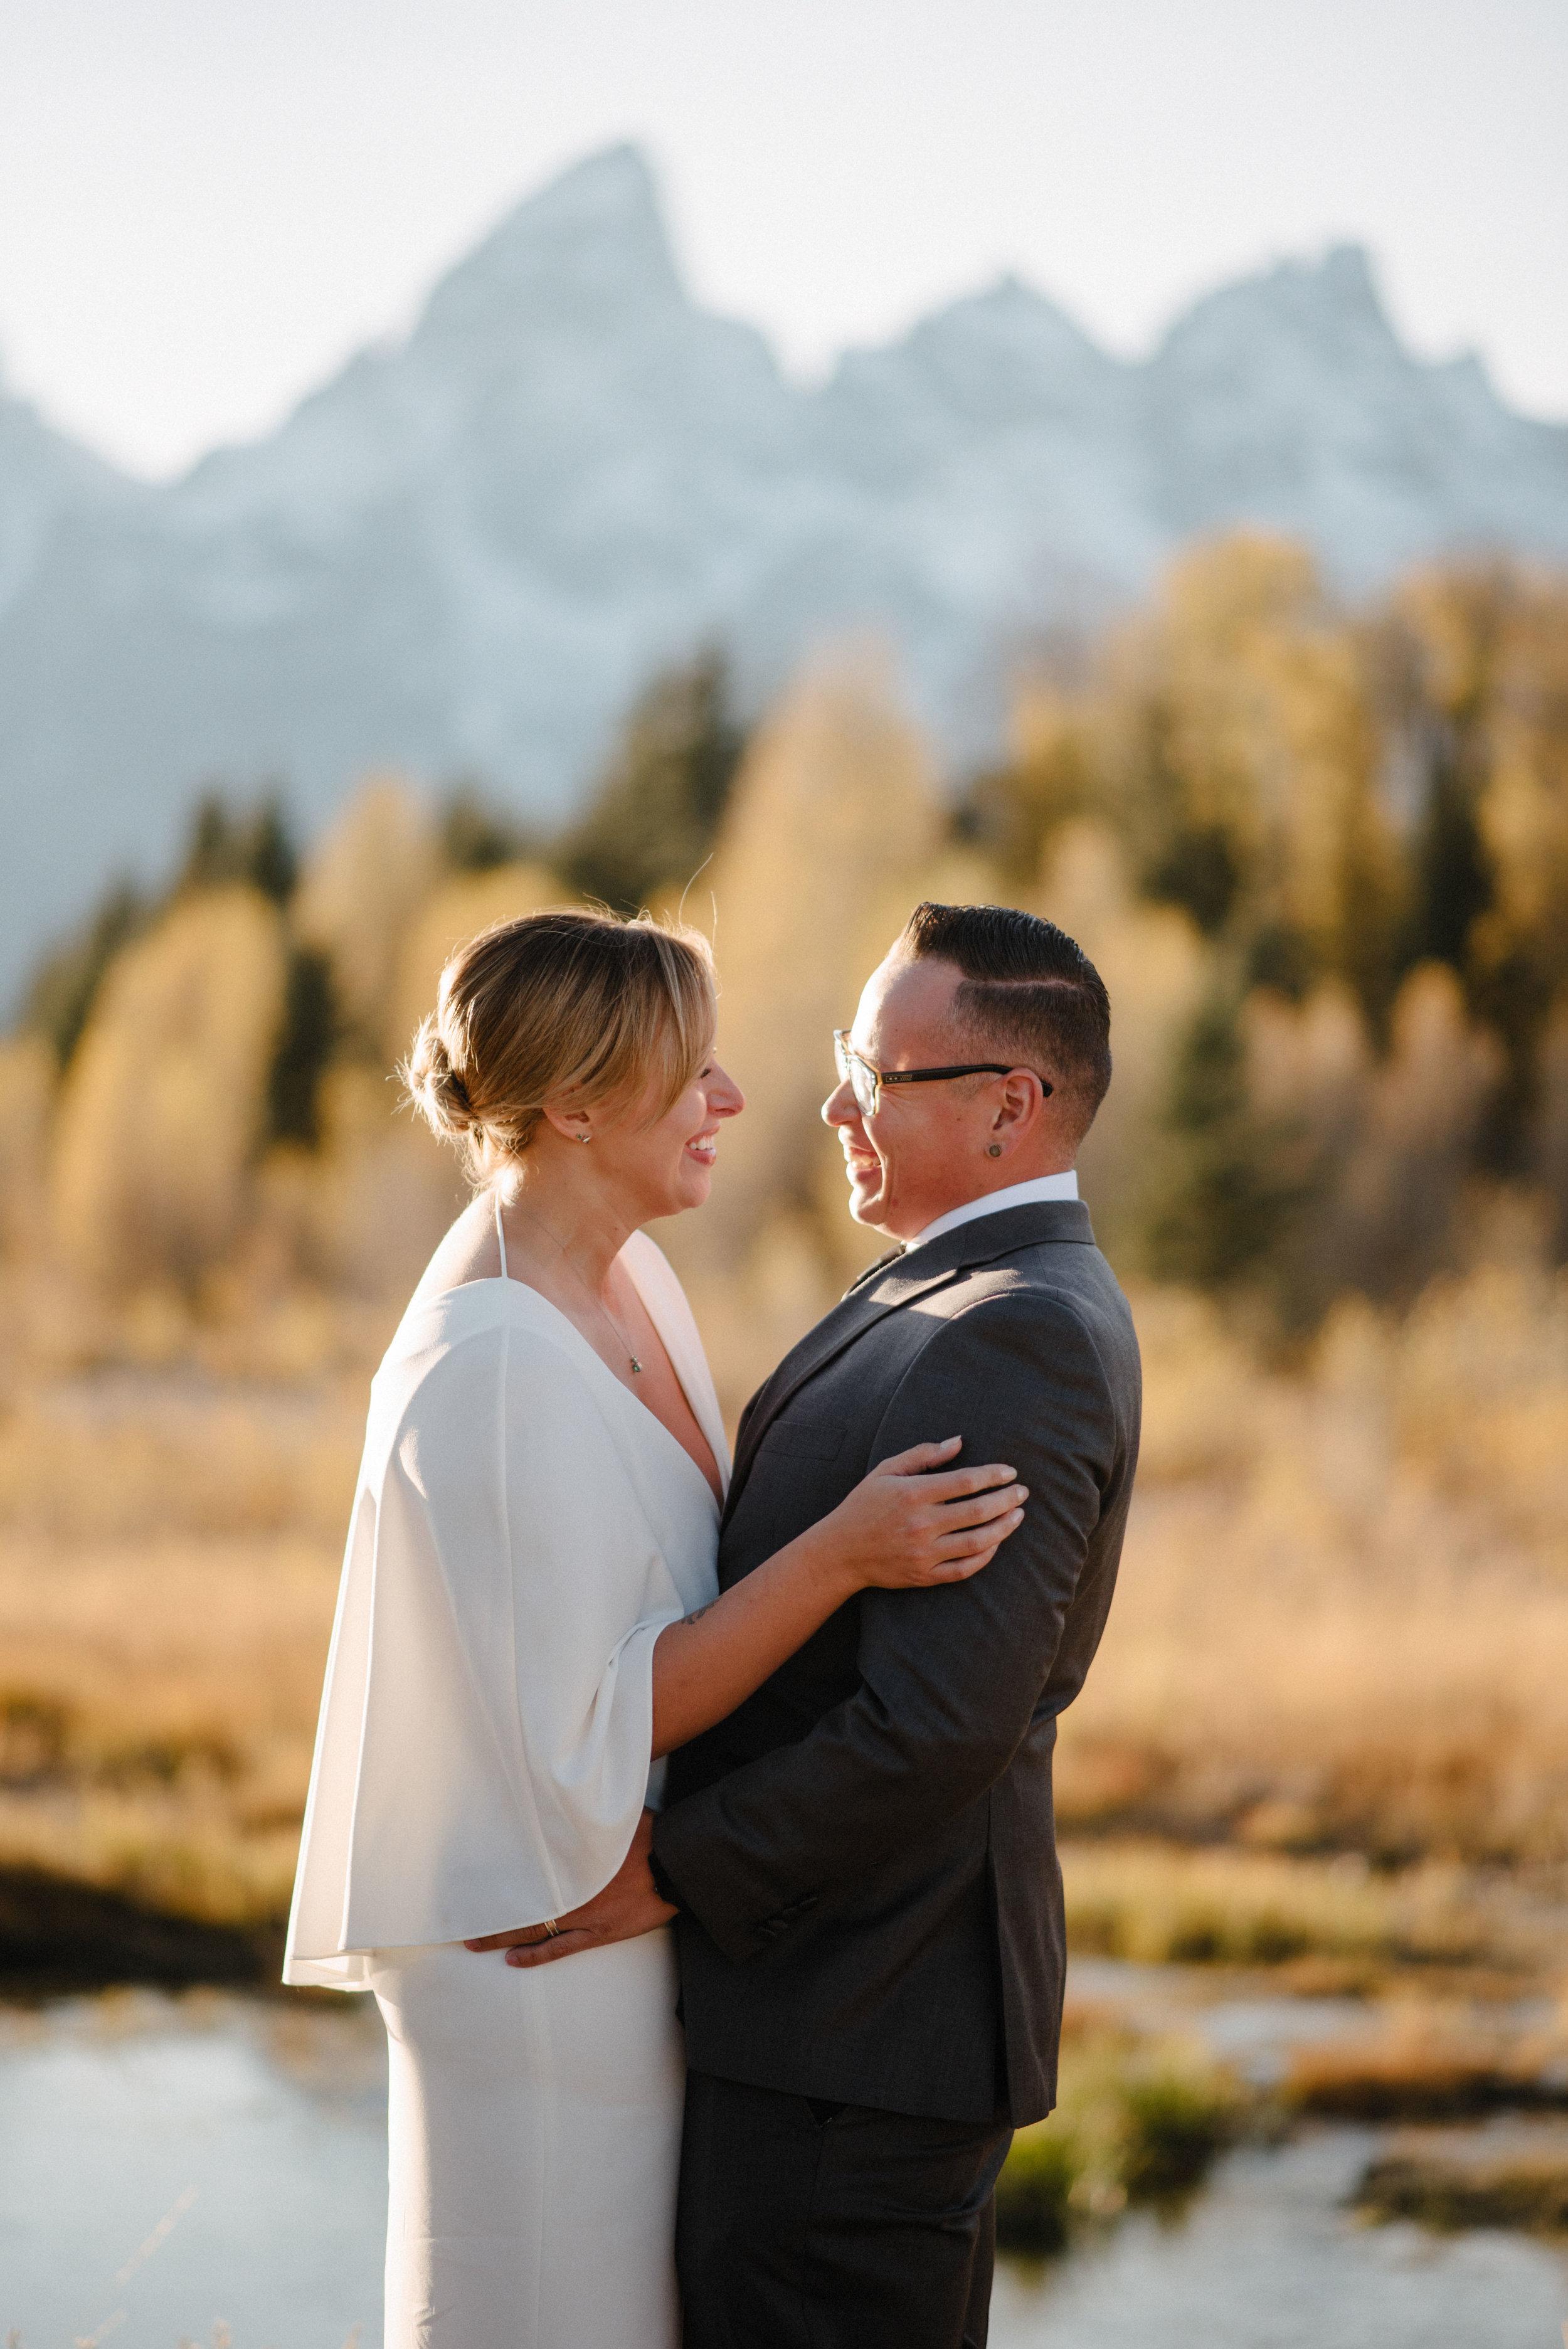 Jackson_Hole_Wedding_Photography_Wyoming_Elopement_Destination_Wedding_Photographer-21.jpg